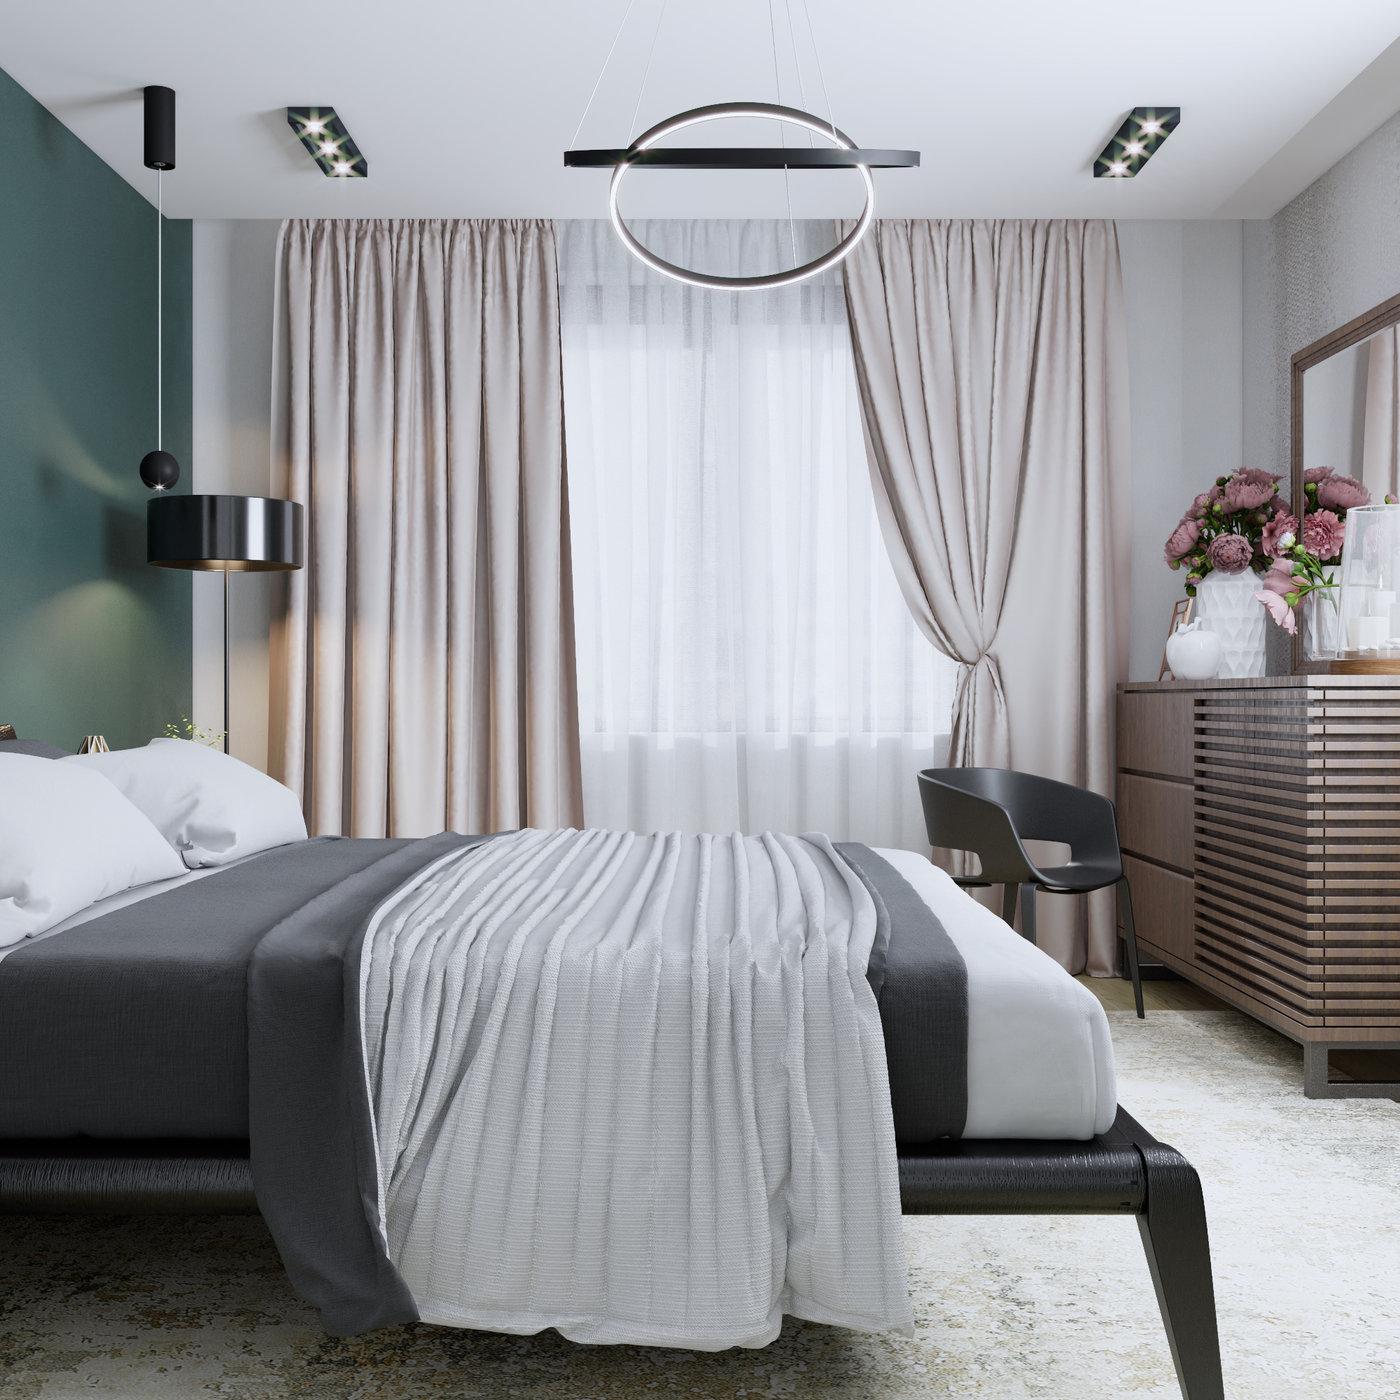 Bedroom done by 3DAG with eklektika